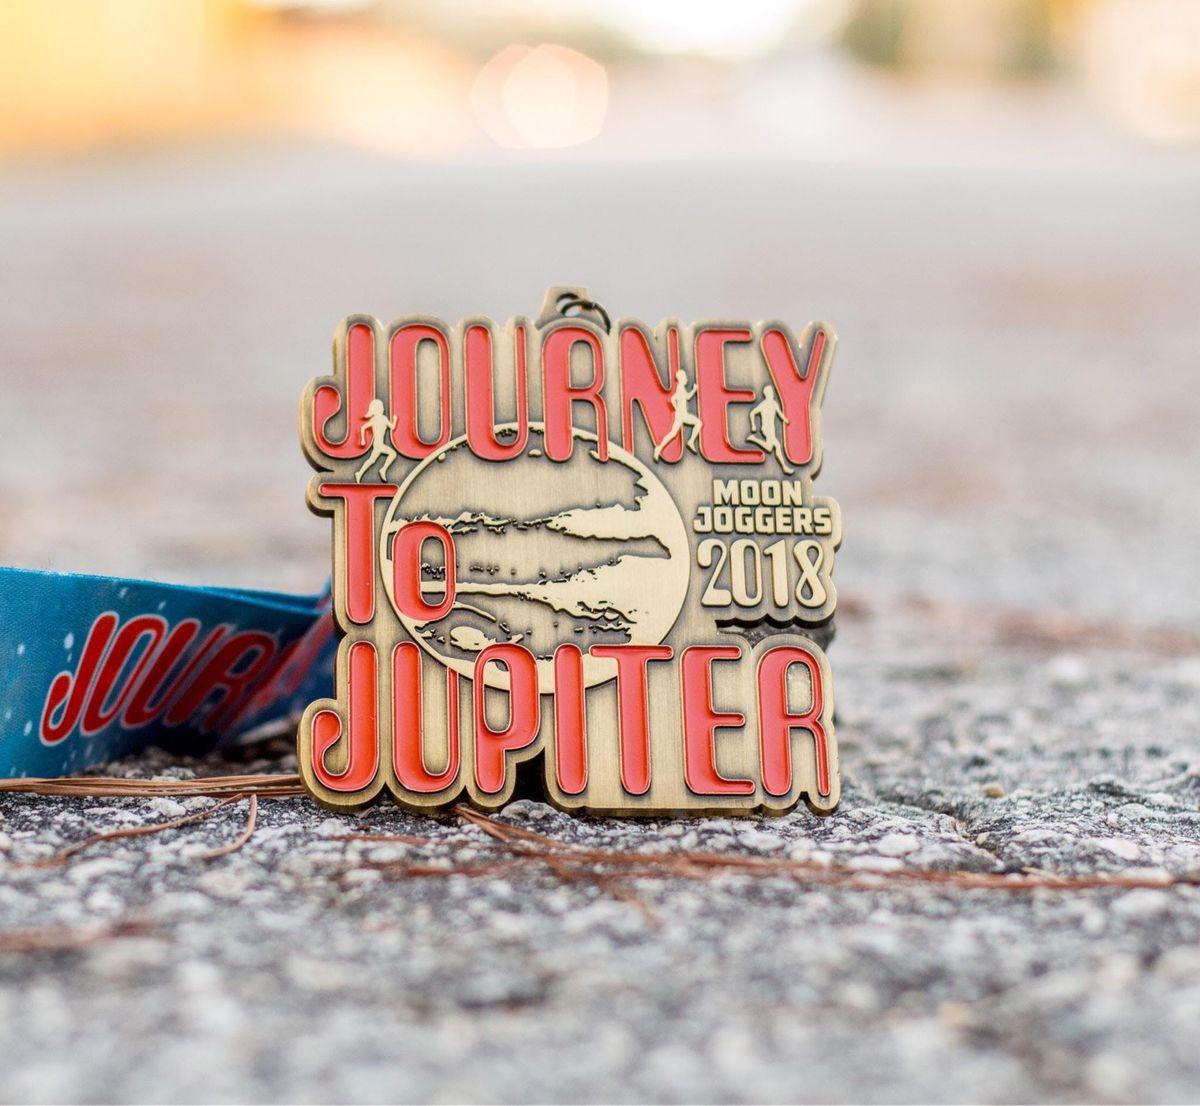 Save 60% NOW Journey to Jupiter Running & Walking Challenge - Albany